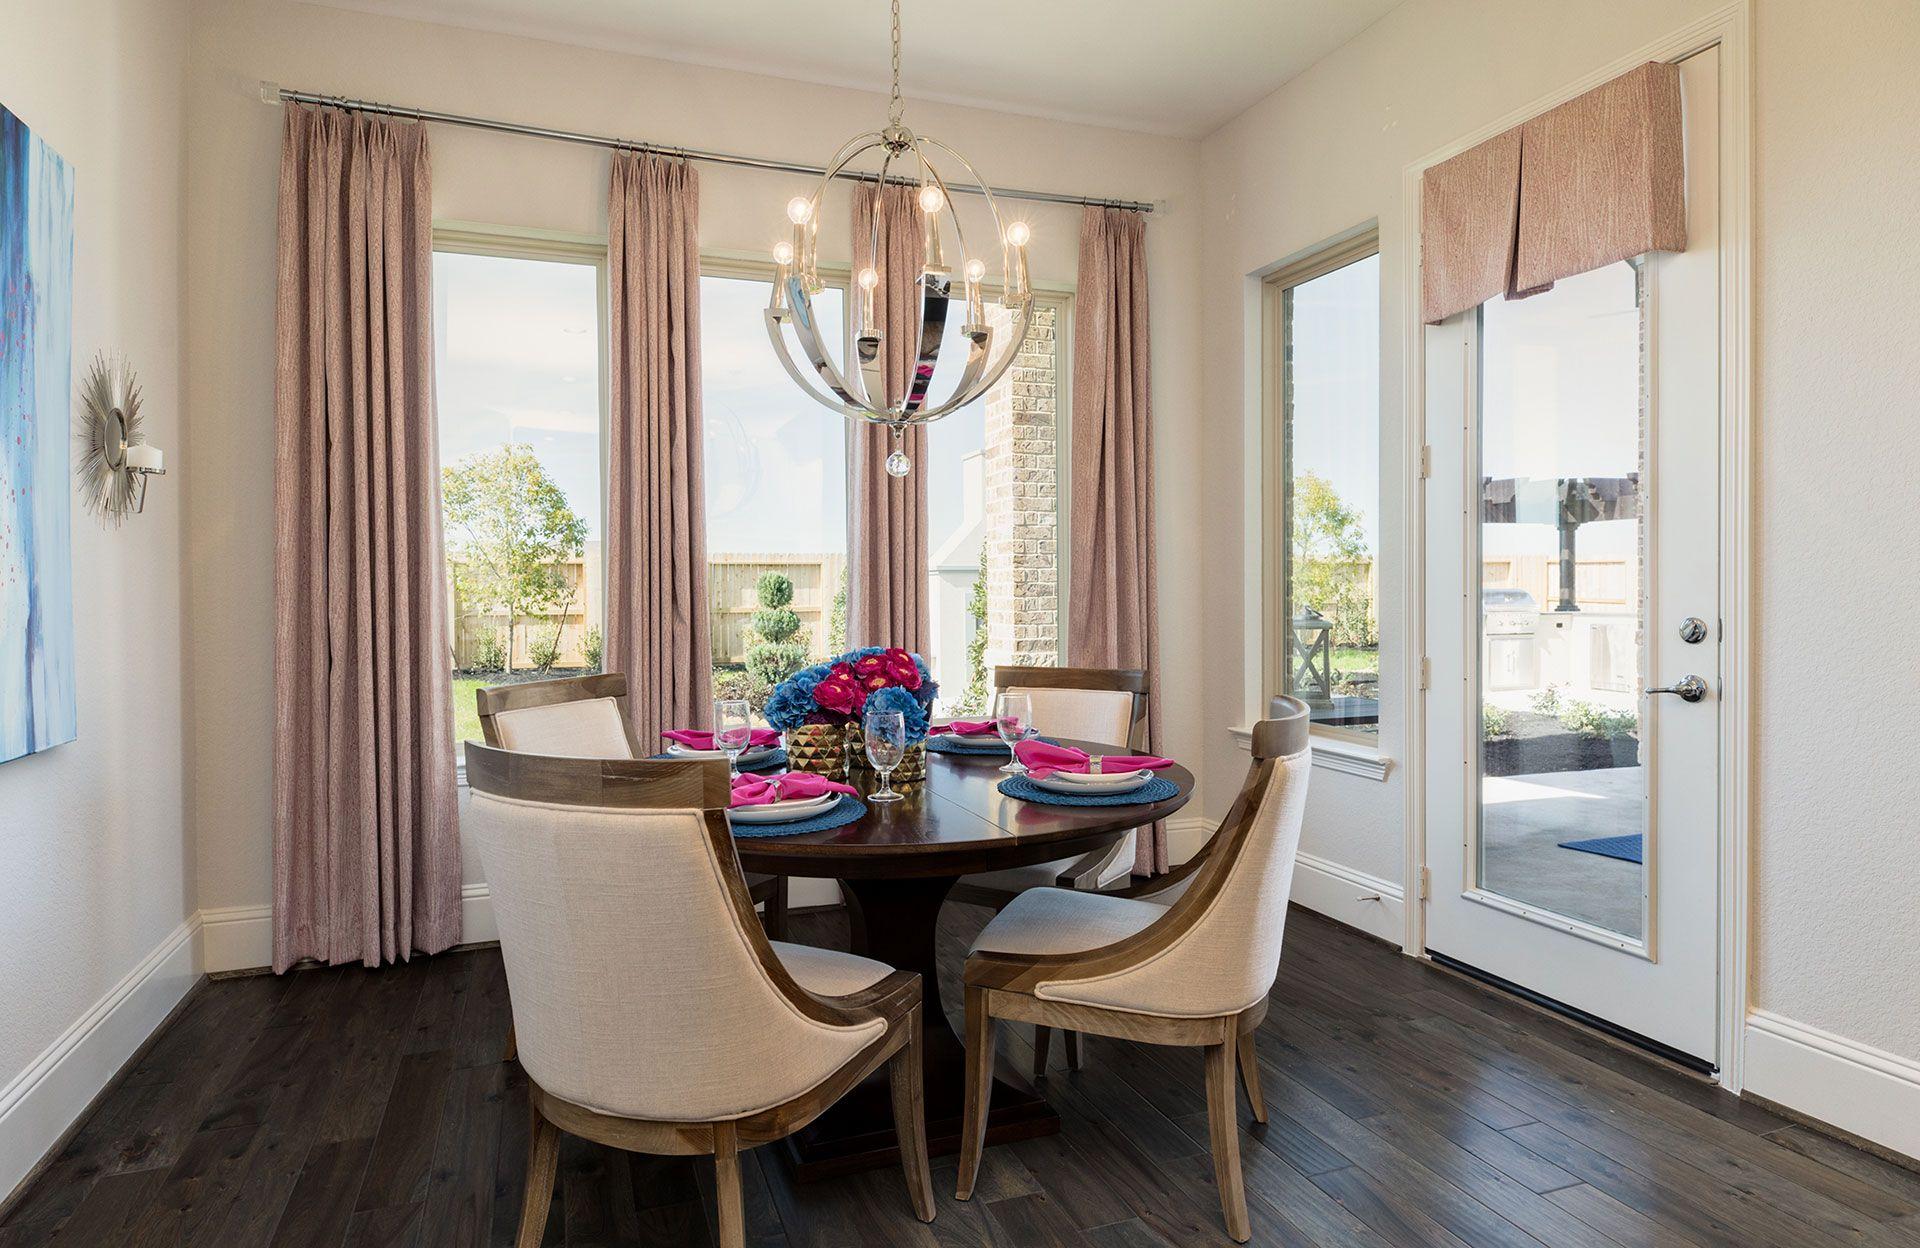 Breakfast-Room-in-Sorenna-at-Houston Offsite-in-Houston